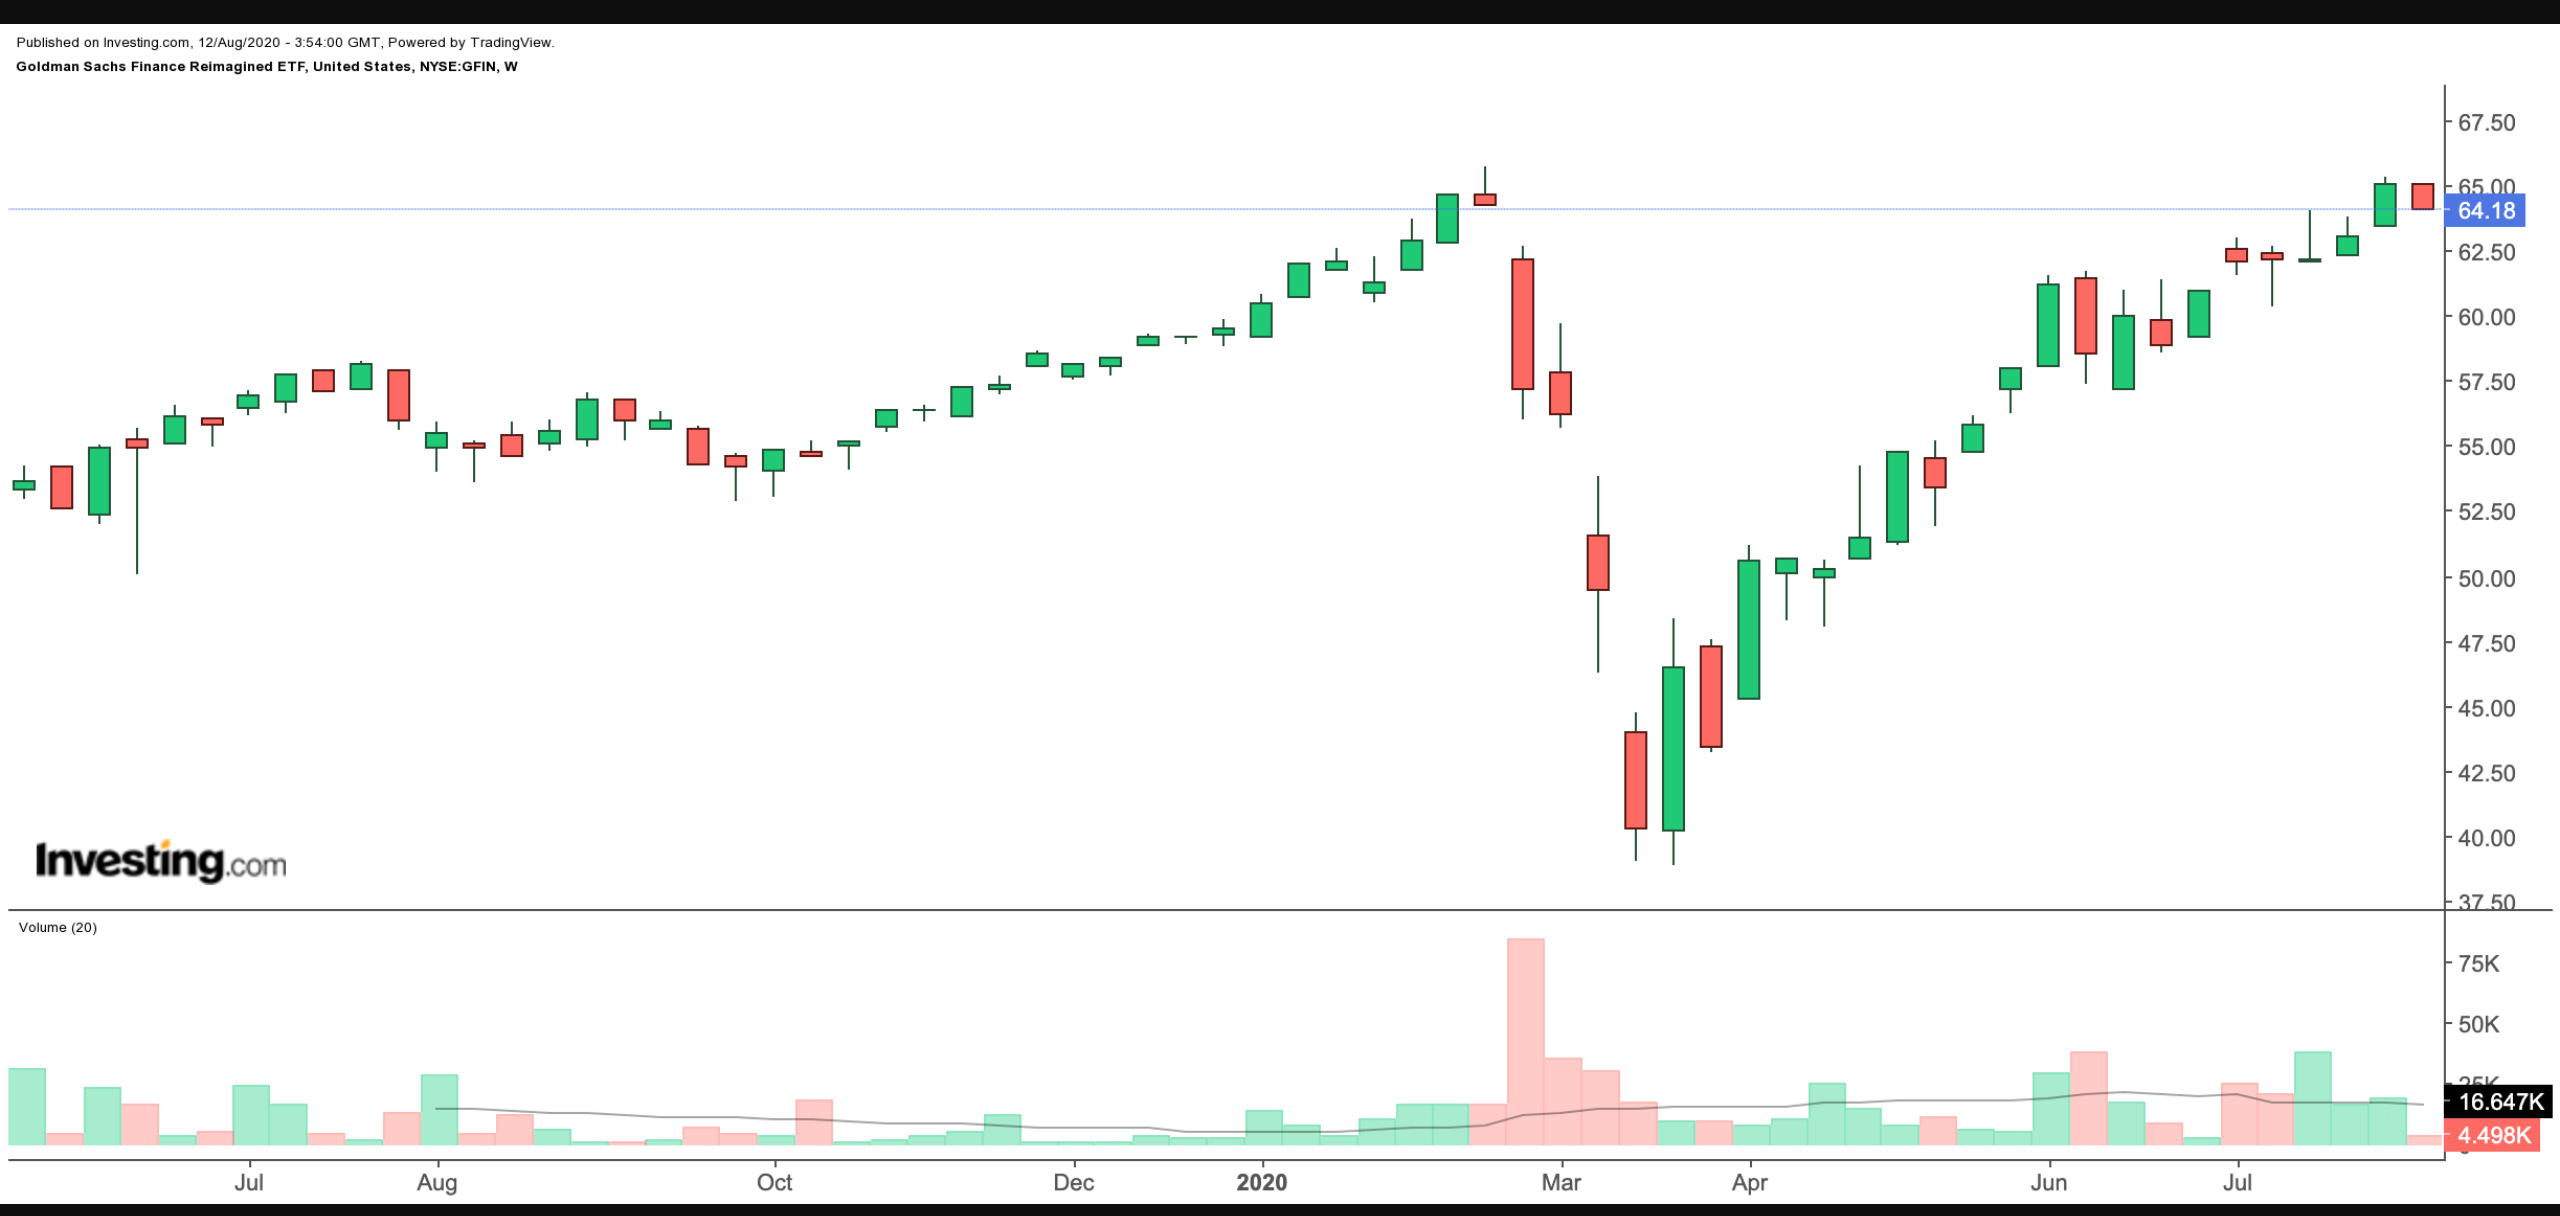 GFIN Chart